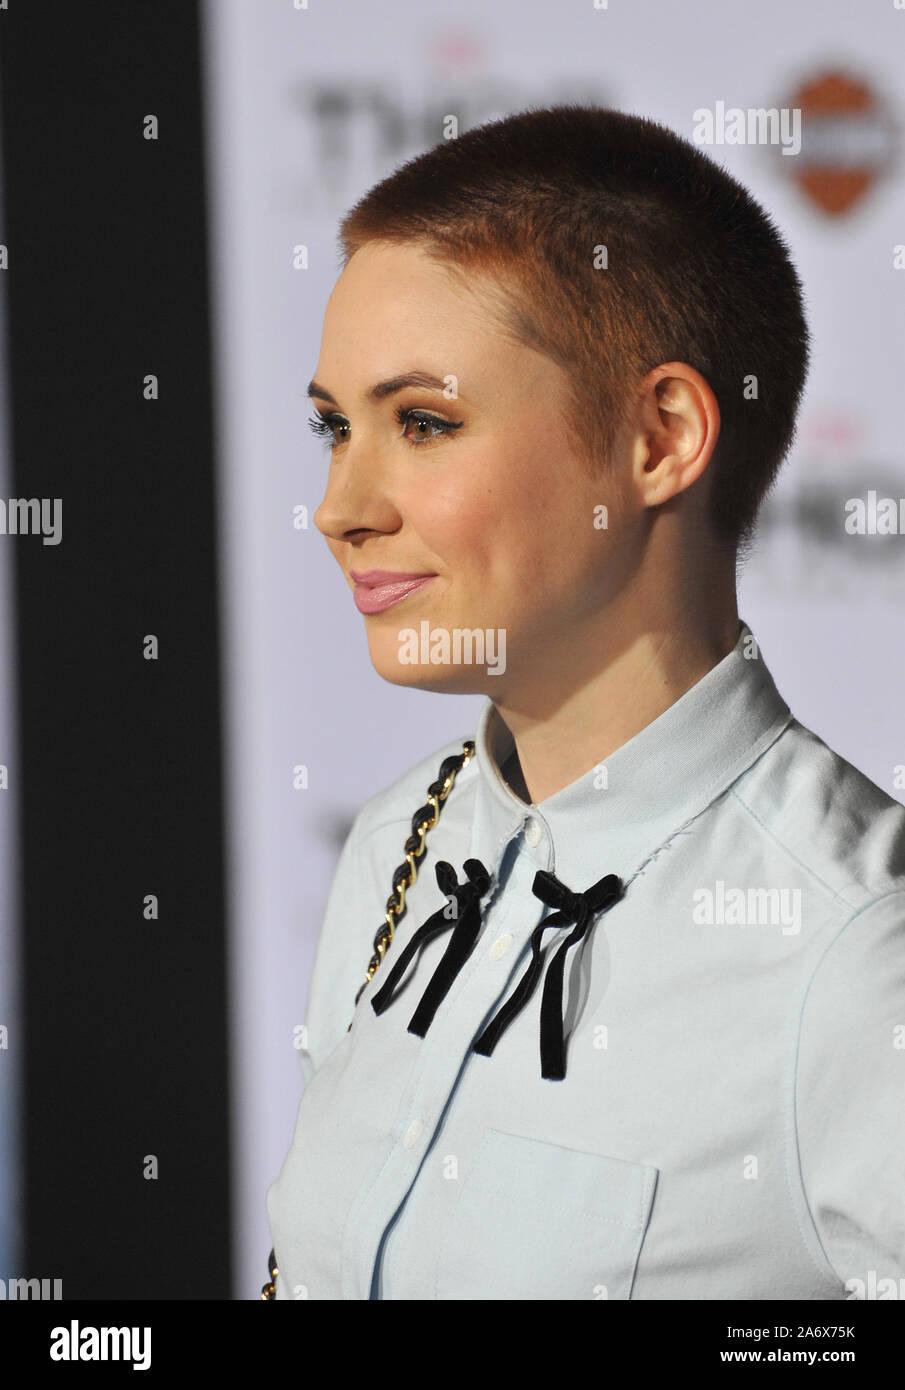 Karen Gillan Short Hair High Resolution Stock Photography And Images Alamy